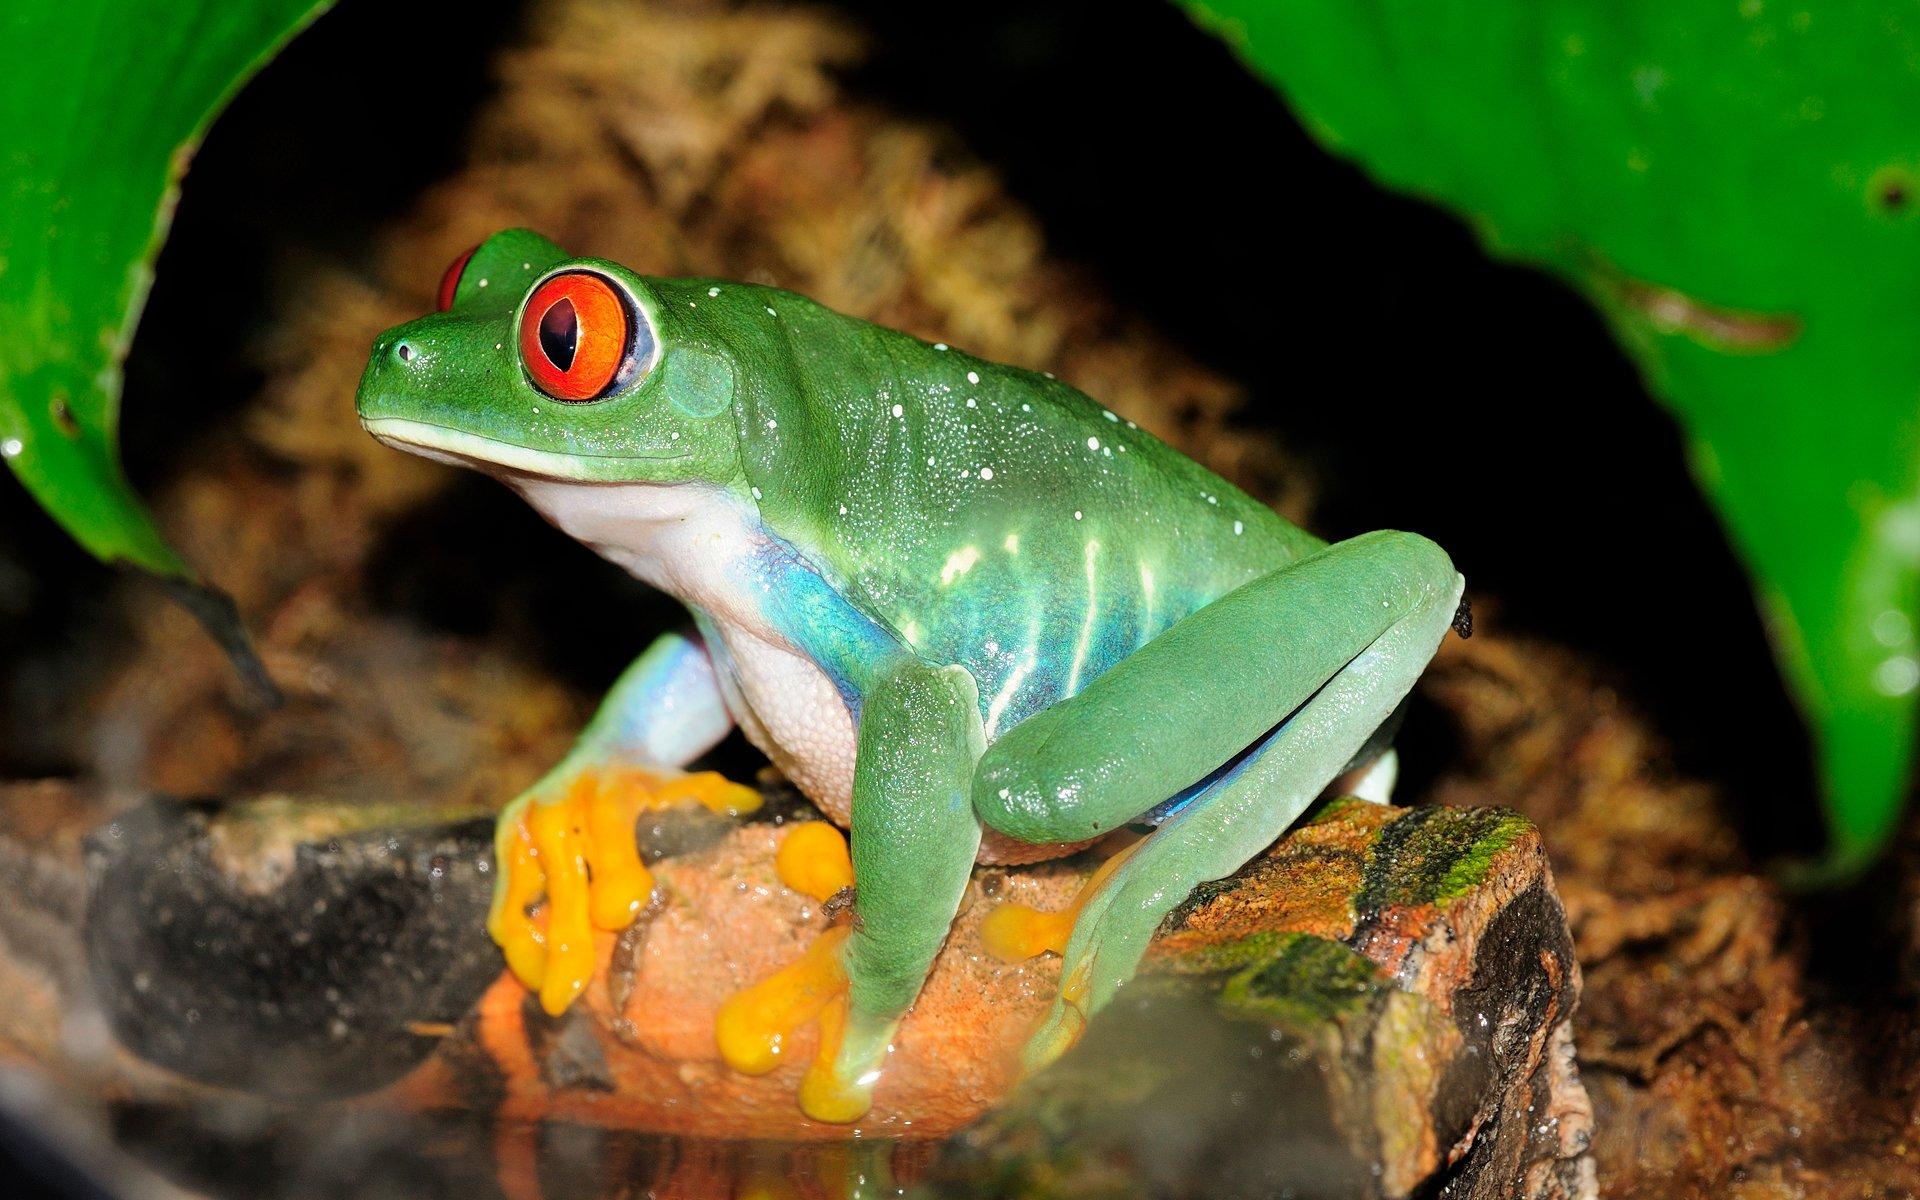 Animal - Red Eyed Tree Frog  Frog Wallpaper